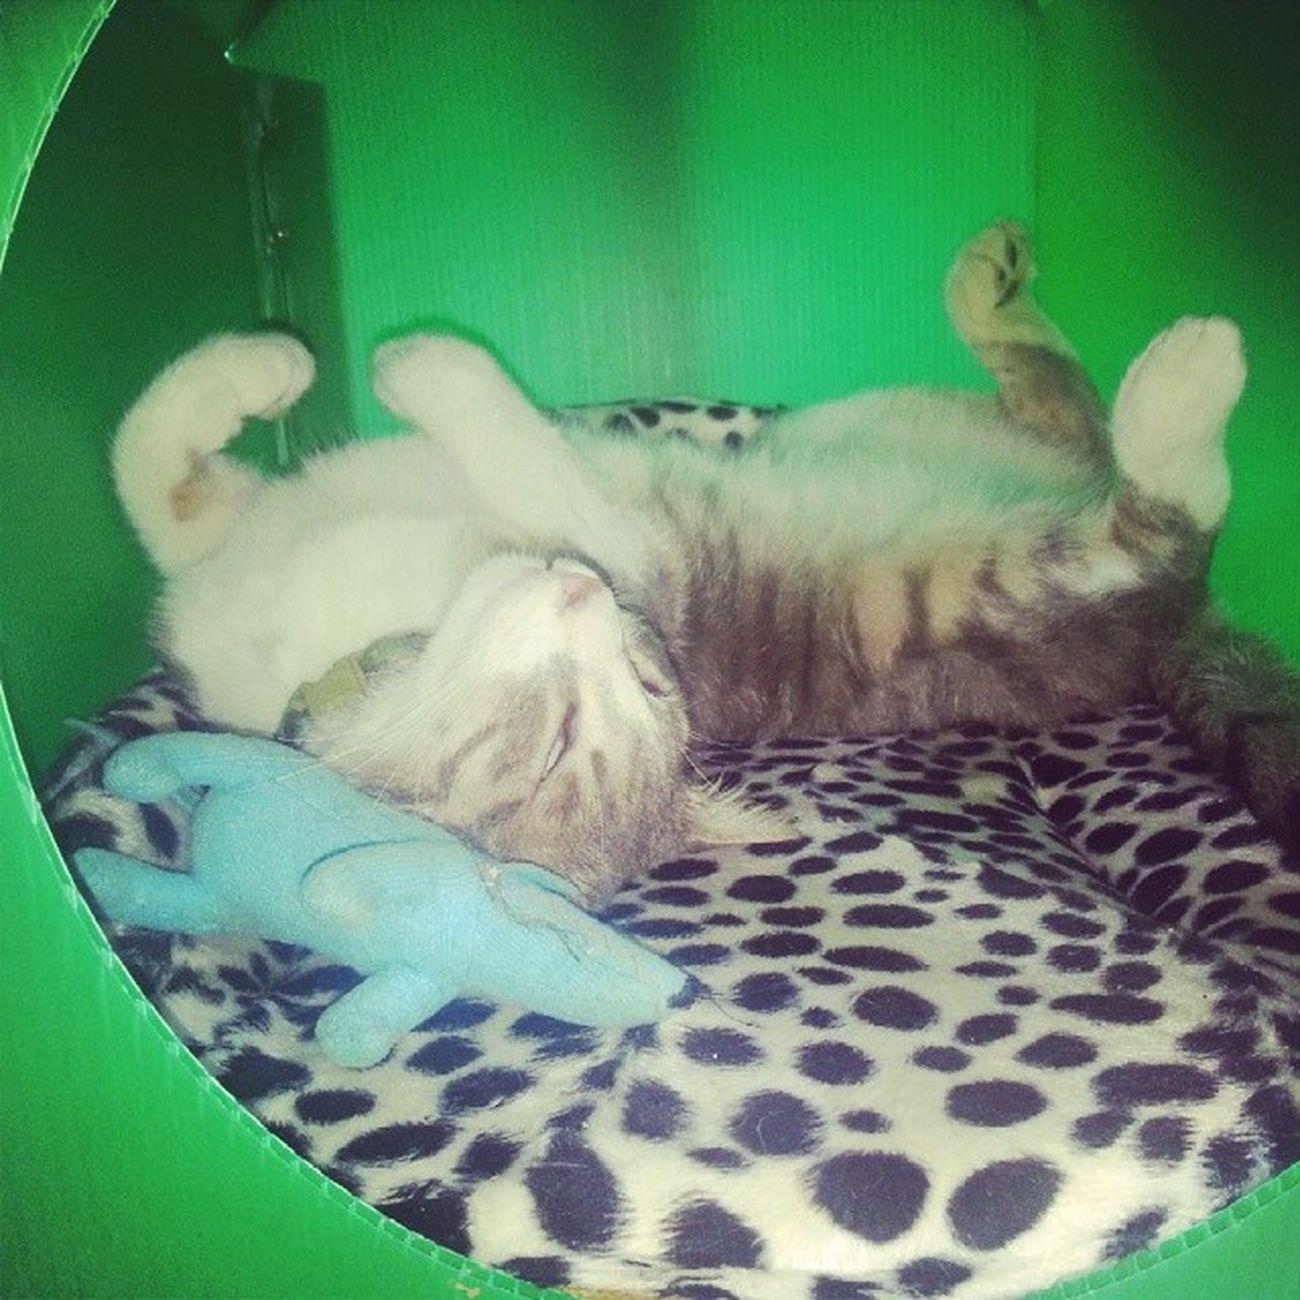 Pes etti oynamaktan helva gibi uyudu yorgunluktan Cat Cats Bilboo Instamood instagoodpicoftheday